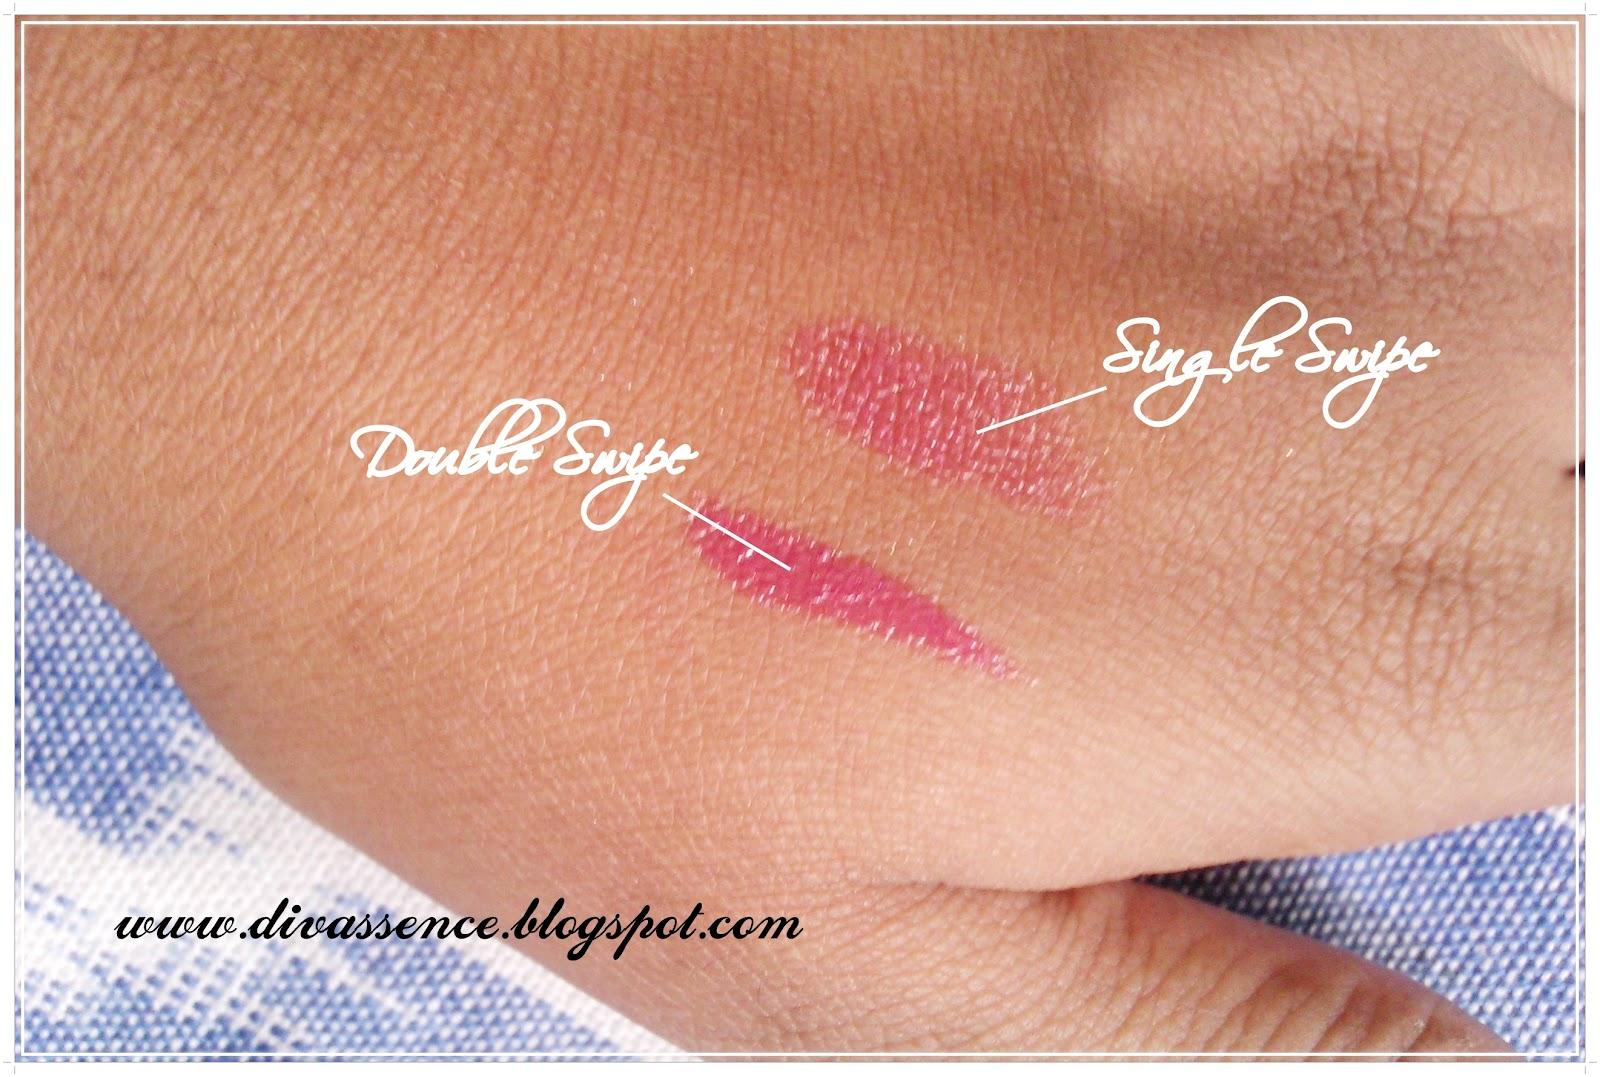 Volume XL Seduction Lip Plumper by Maybelline #3